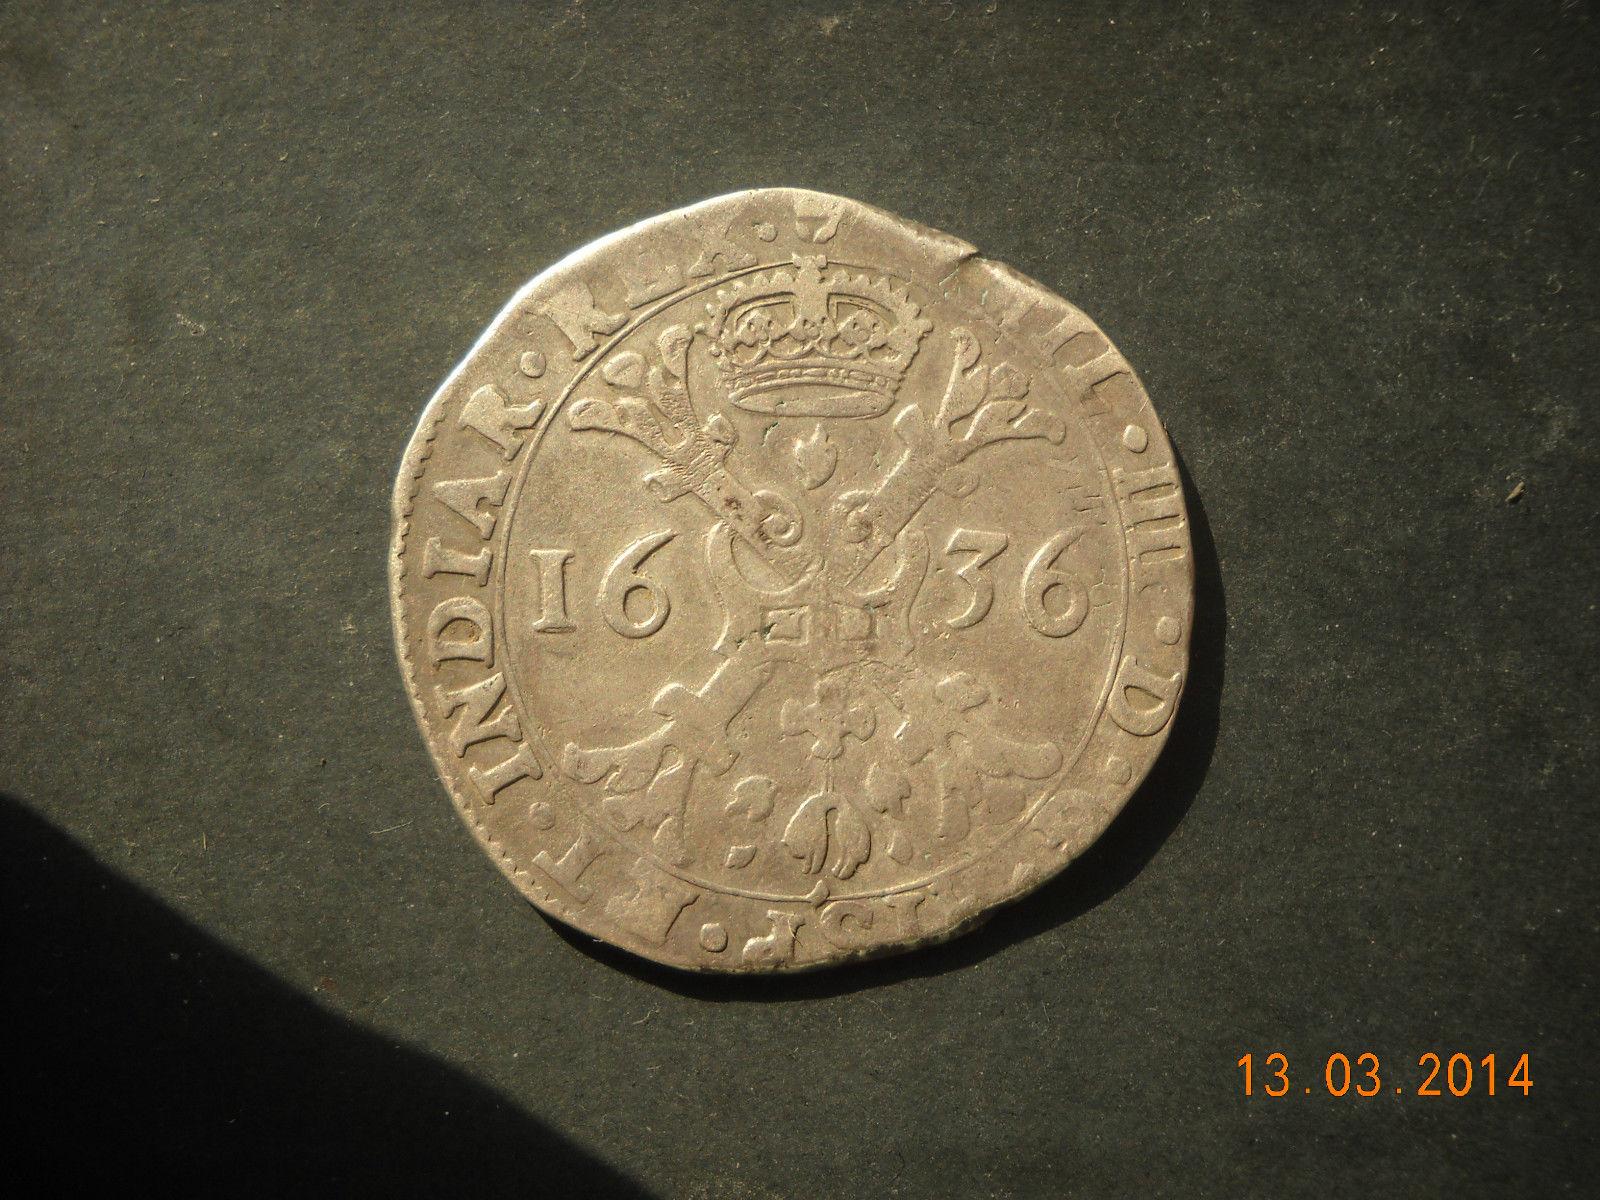 Patagón de 1636, Felipe IV. Ducado de Brabante, ceca de Amberes 2lxzaqd